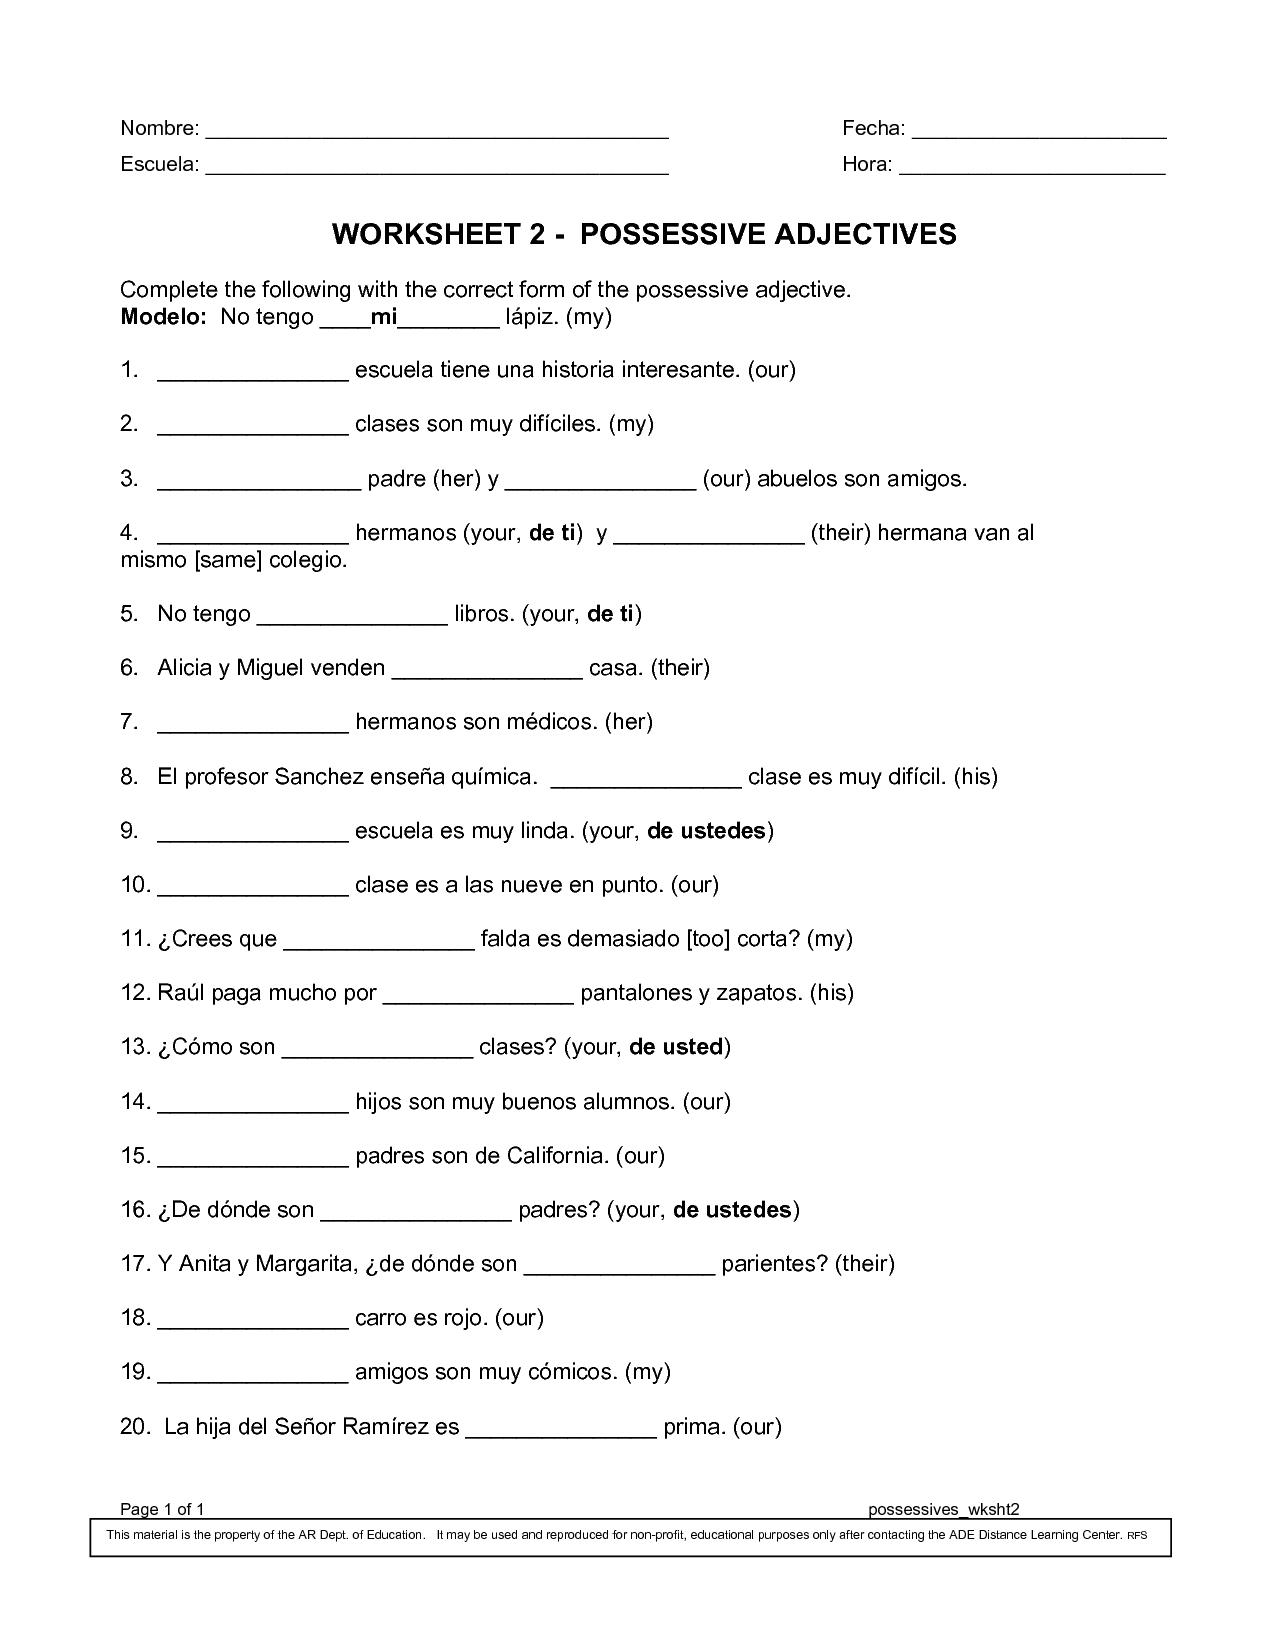 39 Awesome Possessives Adjectives Worksheet Images